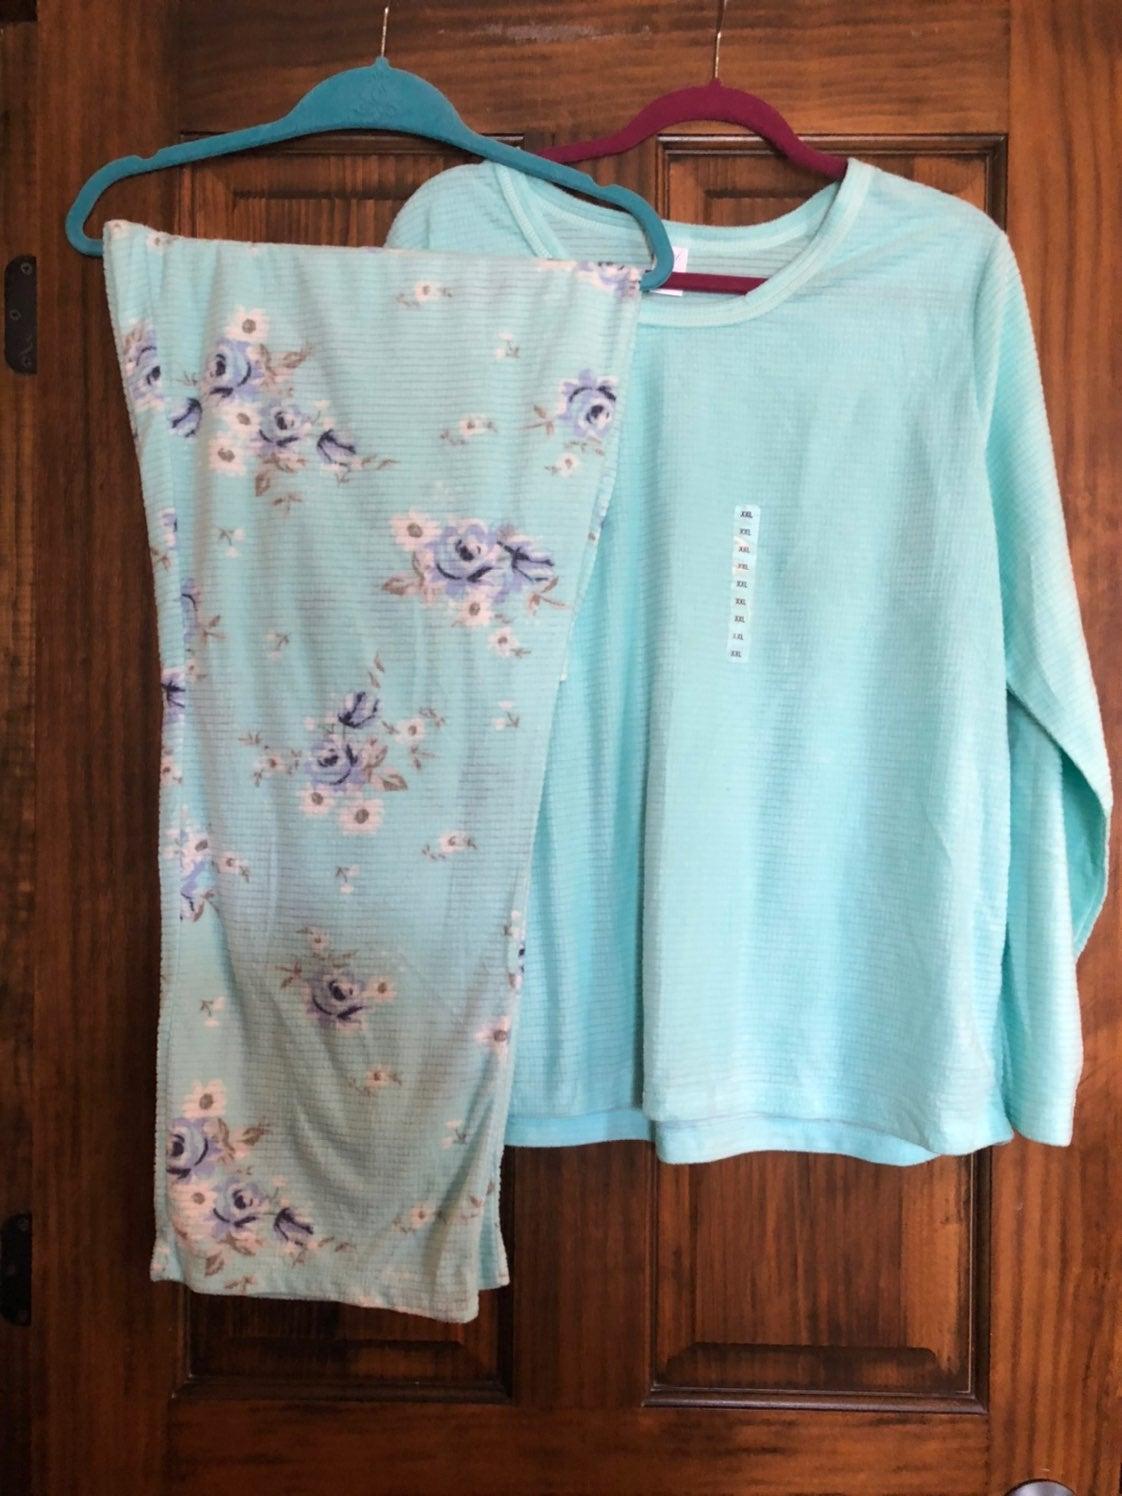 Adonna sleepwear - womens plus size